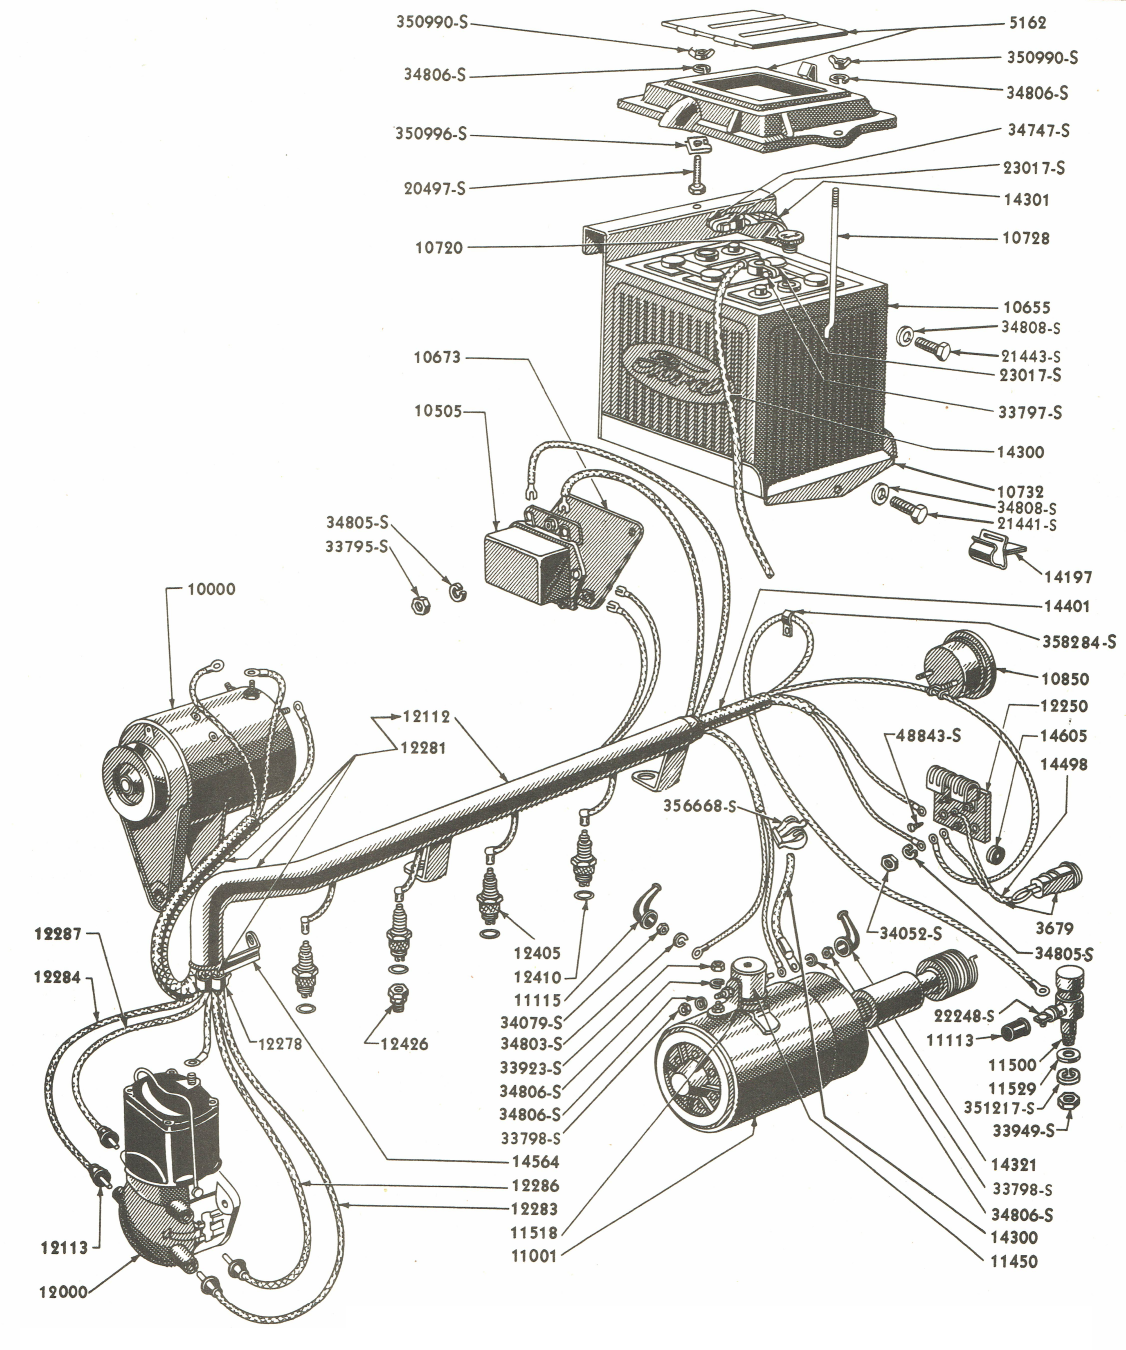 Diagram] Ford 9N Tractor Spark Plug Wiring Diagram Full